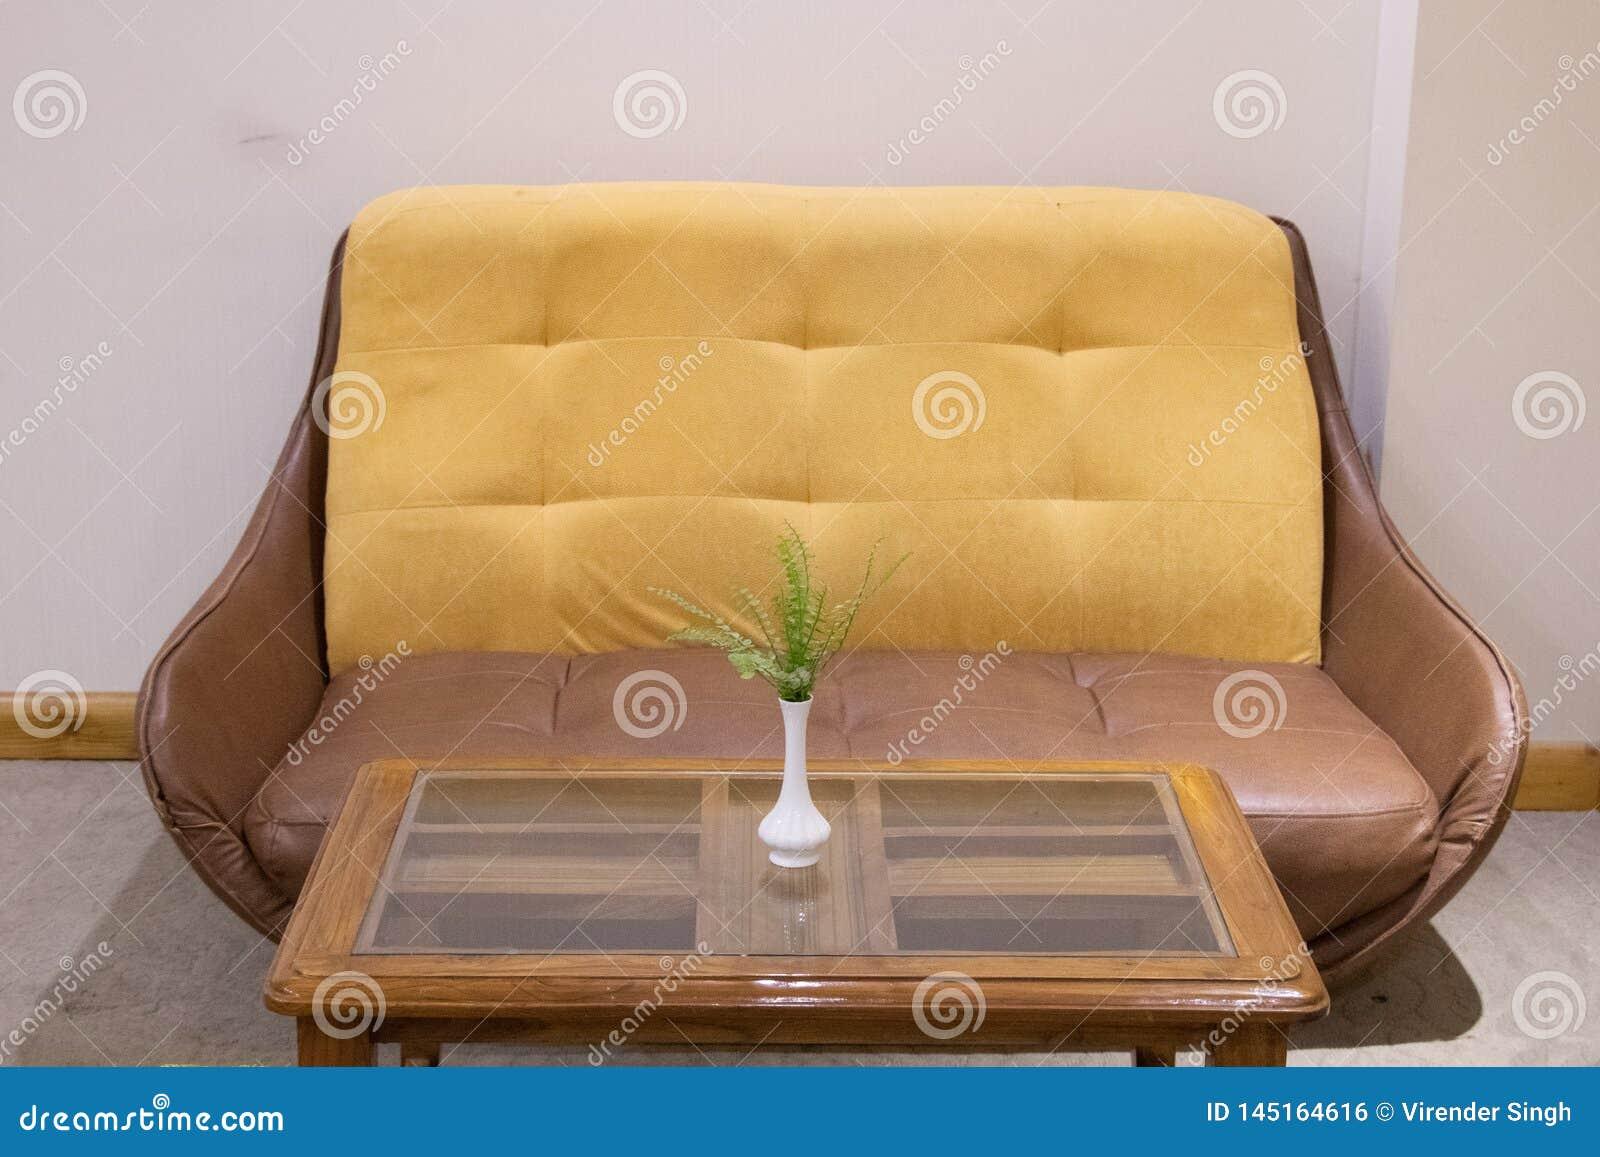 Sofa und Tabelle